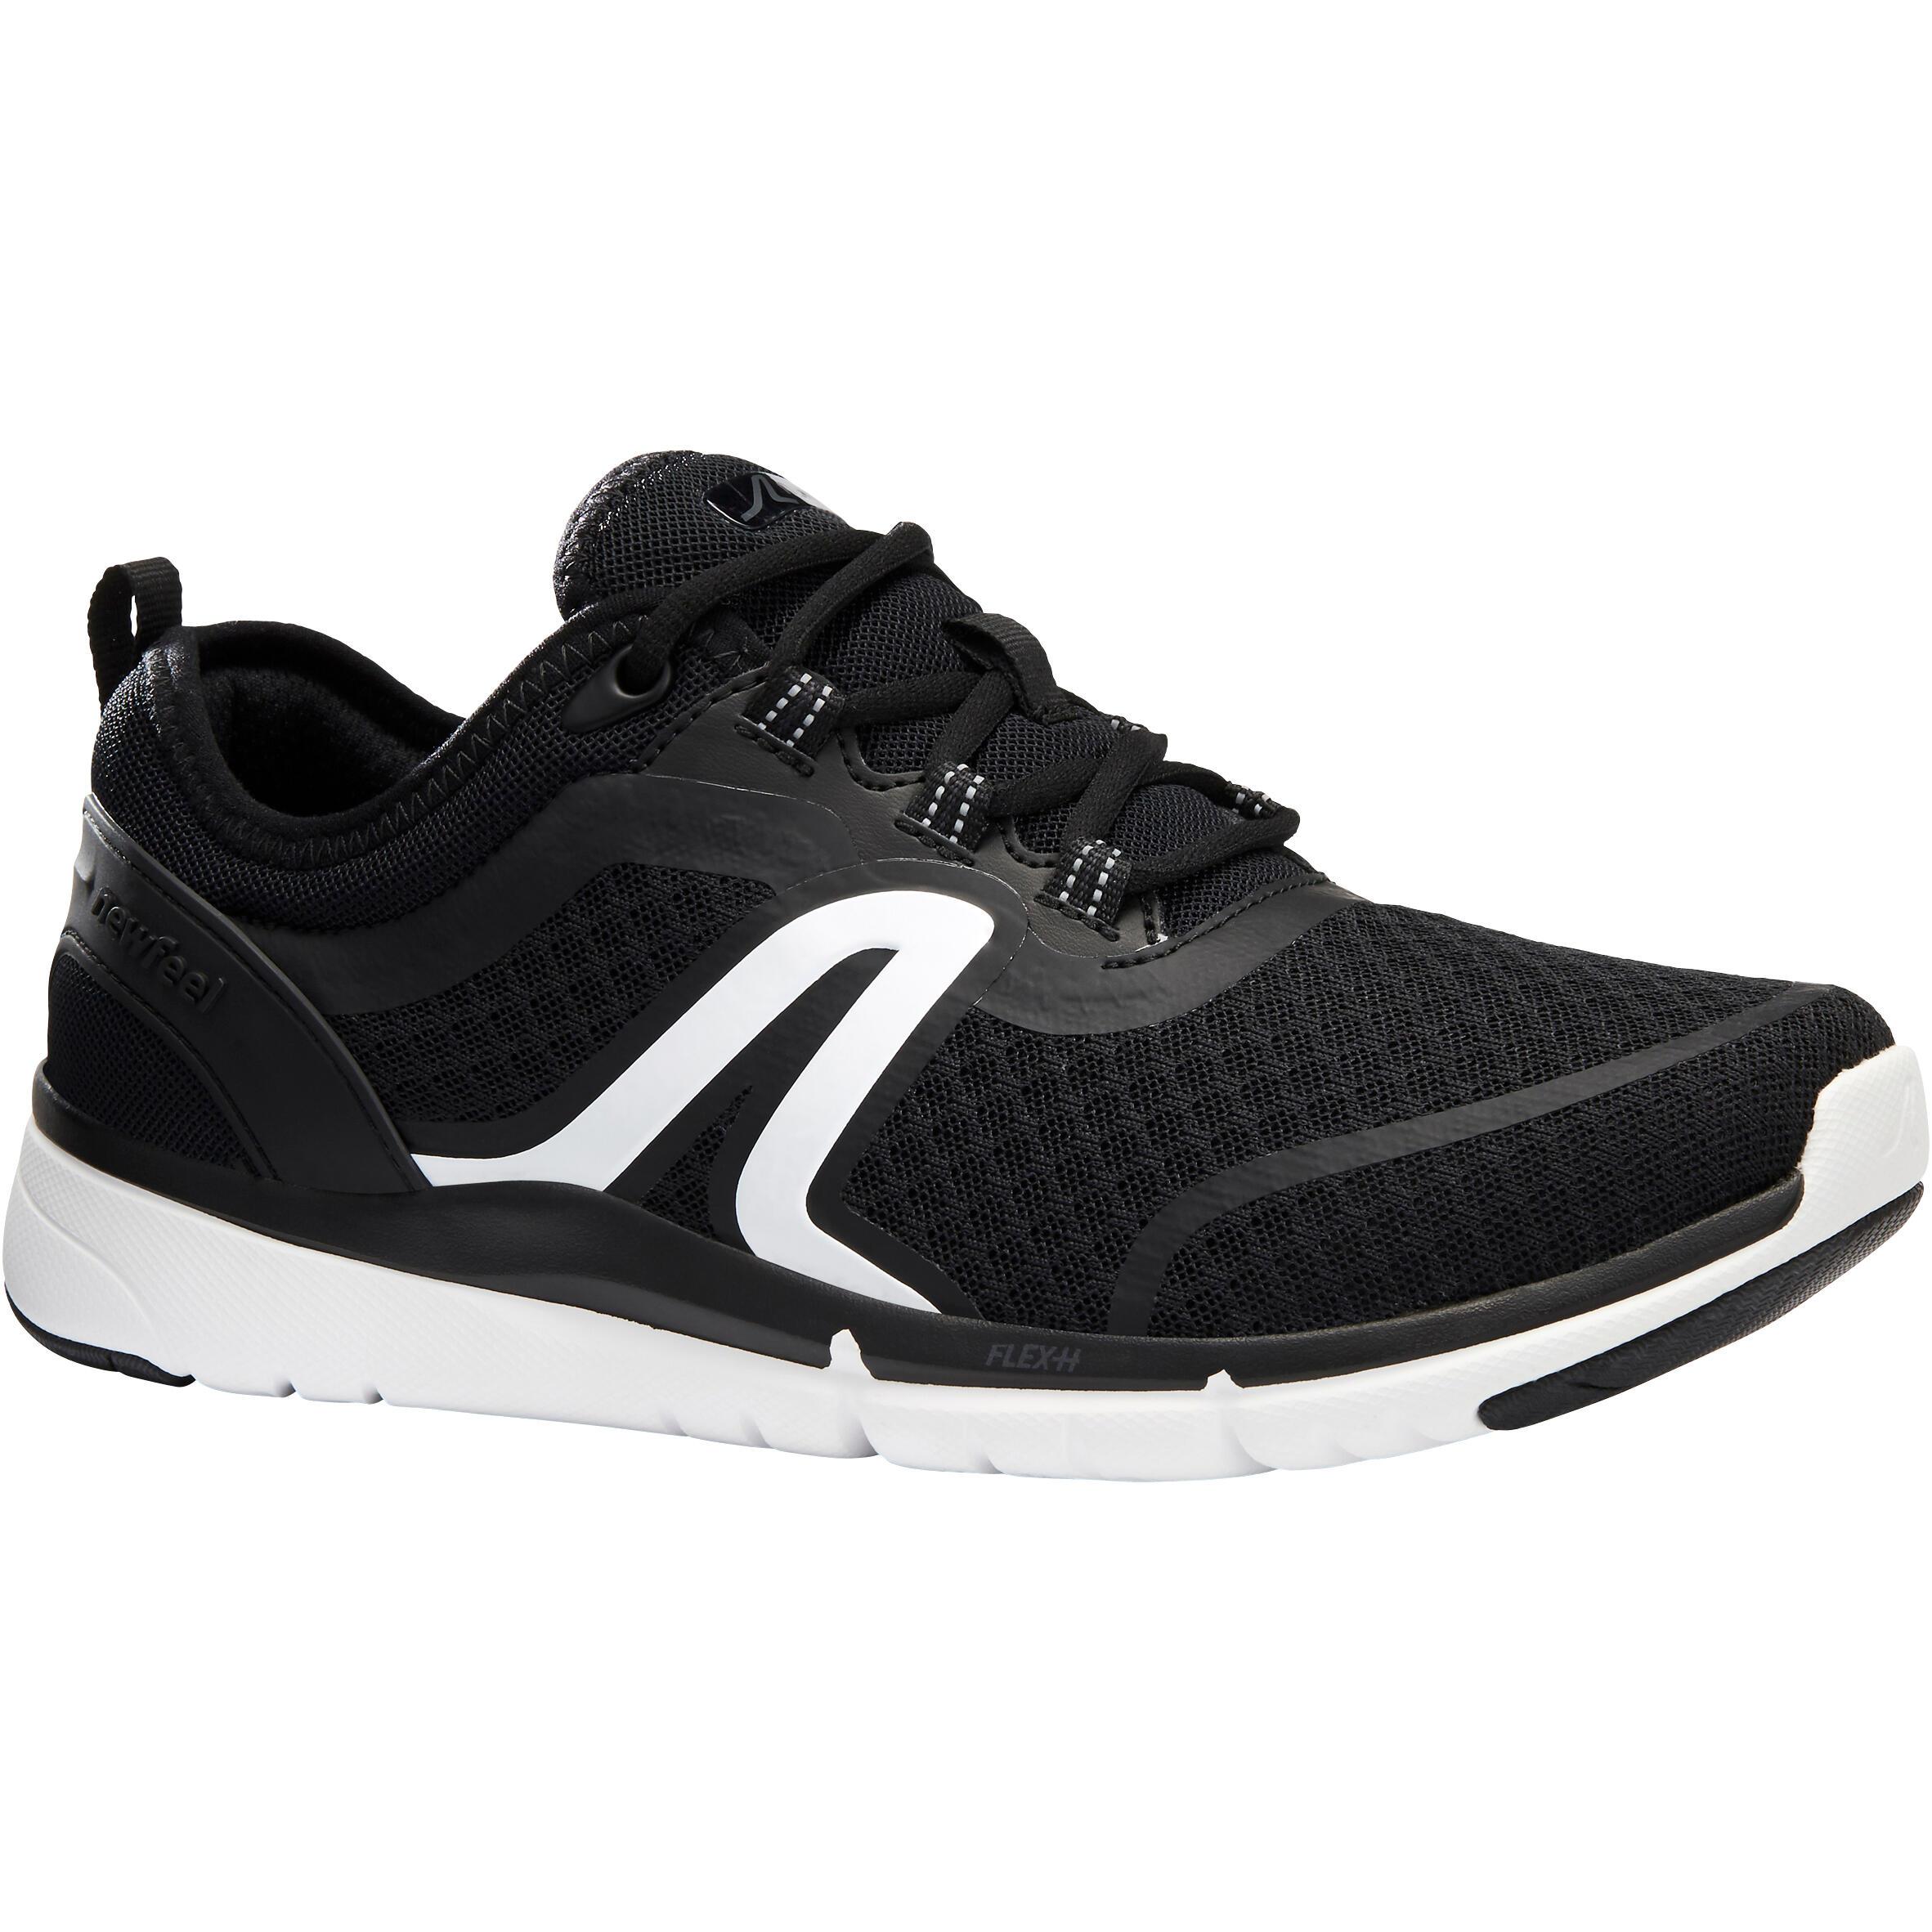 Walkingschuhe Soft 540 Mesh Damen schwarz/weiß | Schuhe > Sportschuhe > Walkingschuhe | Schwarz - Weiß | Newfeel